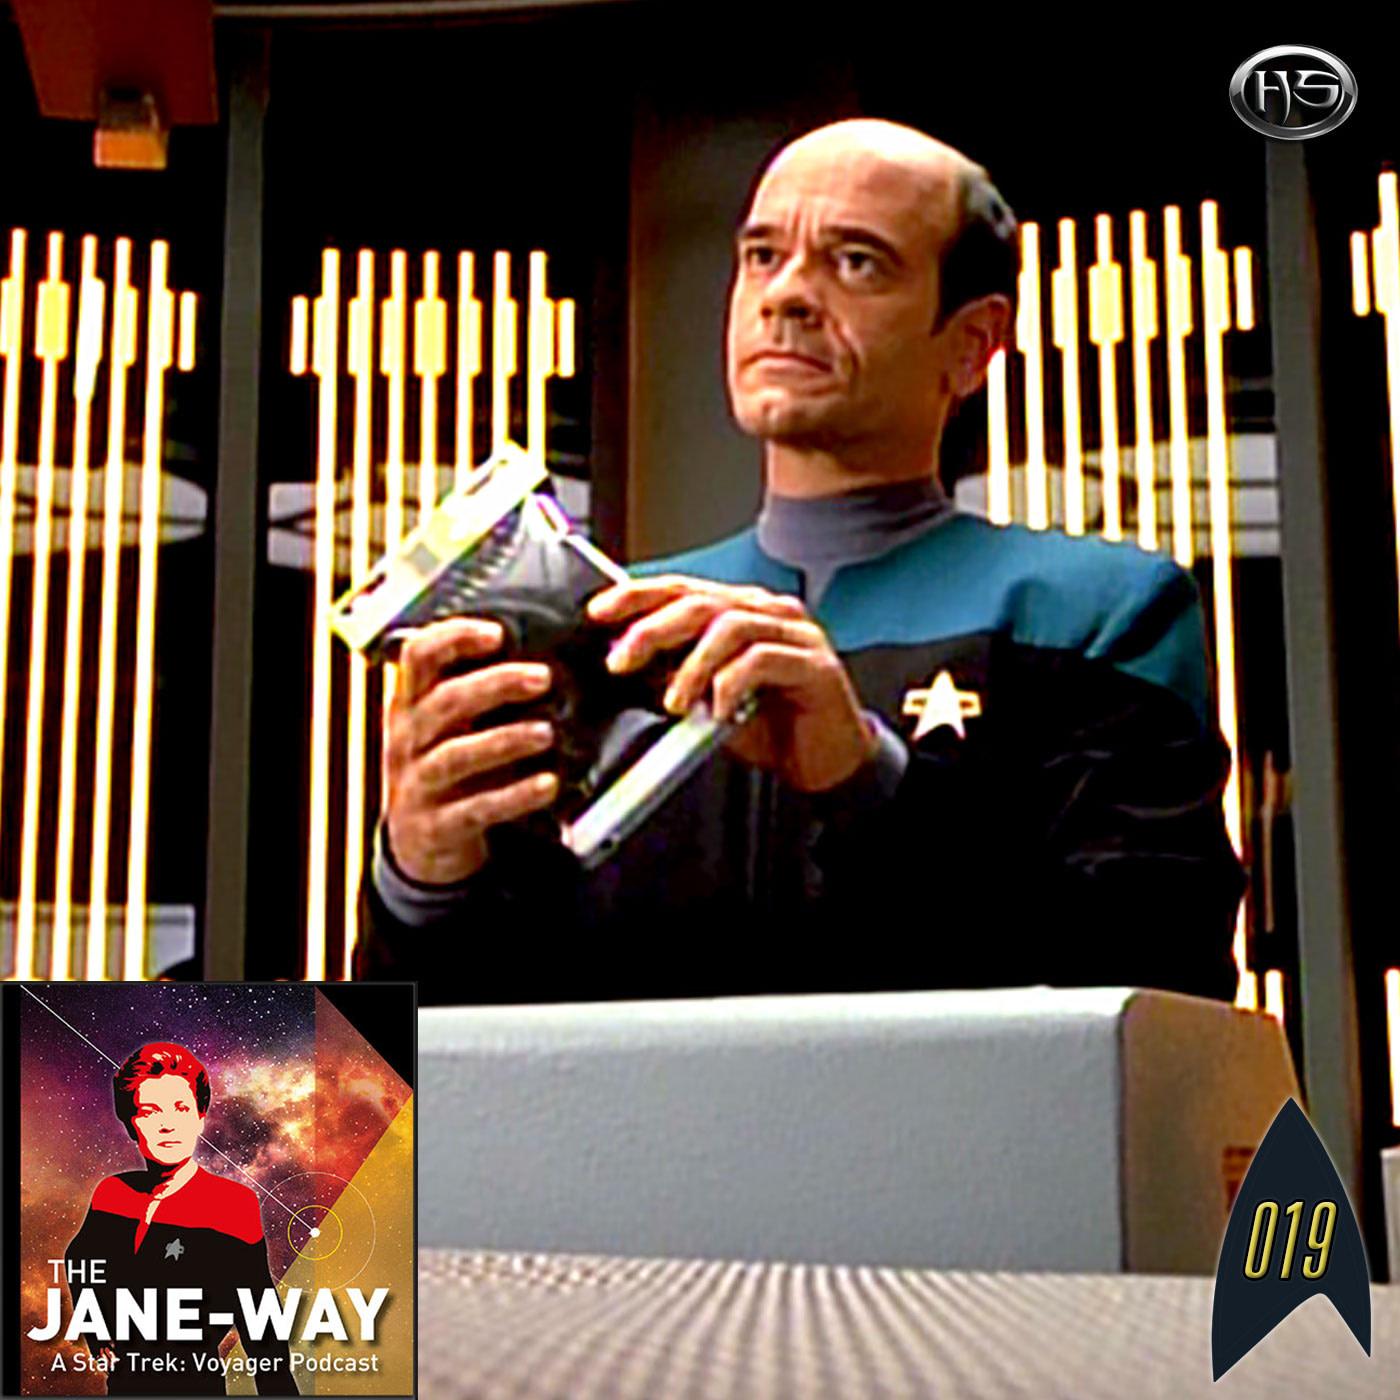 The Jane-Way Episode 19